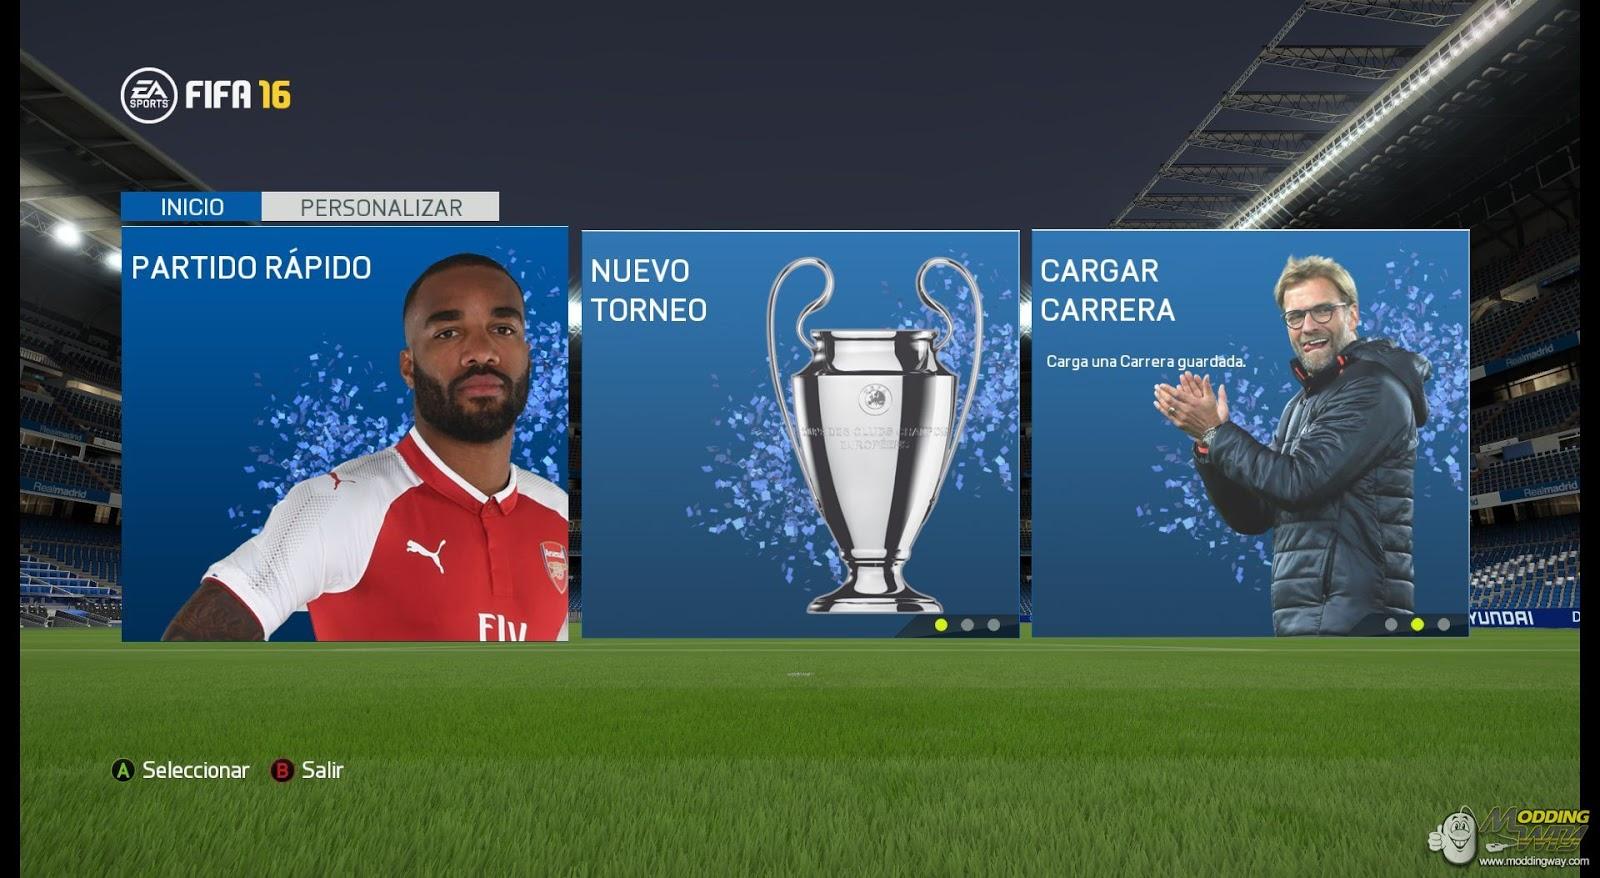 FIFA 16 ModdingWay Mod Update 18.0.2 Season 2017/2018 ...